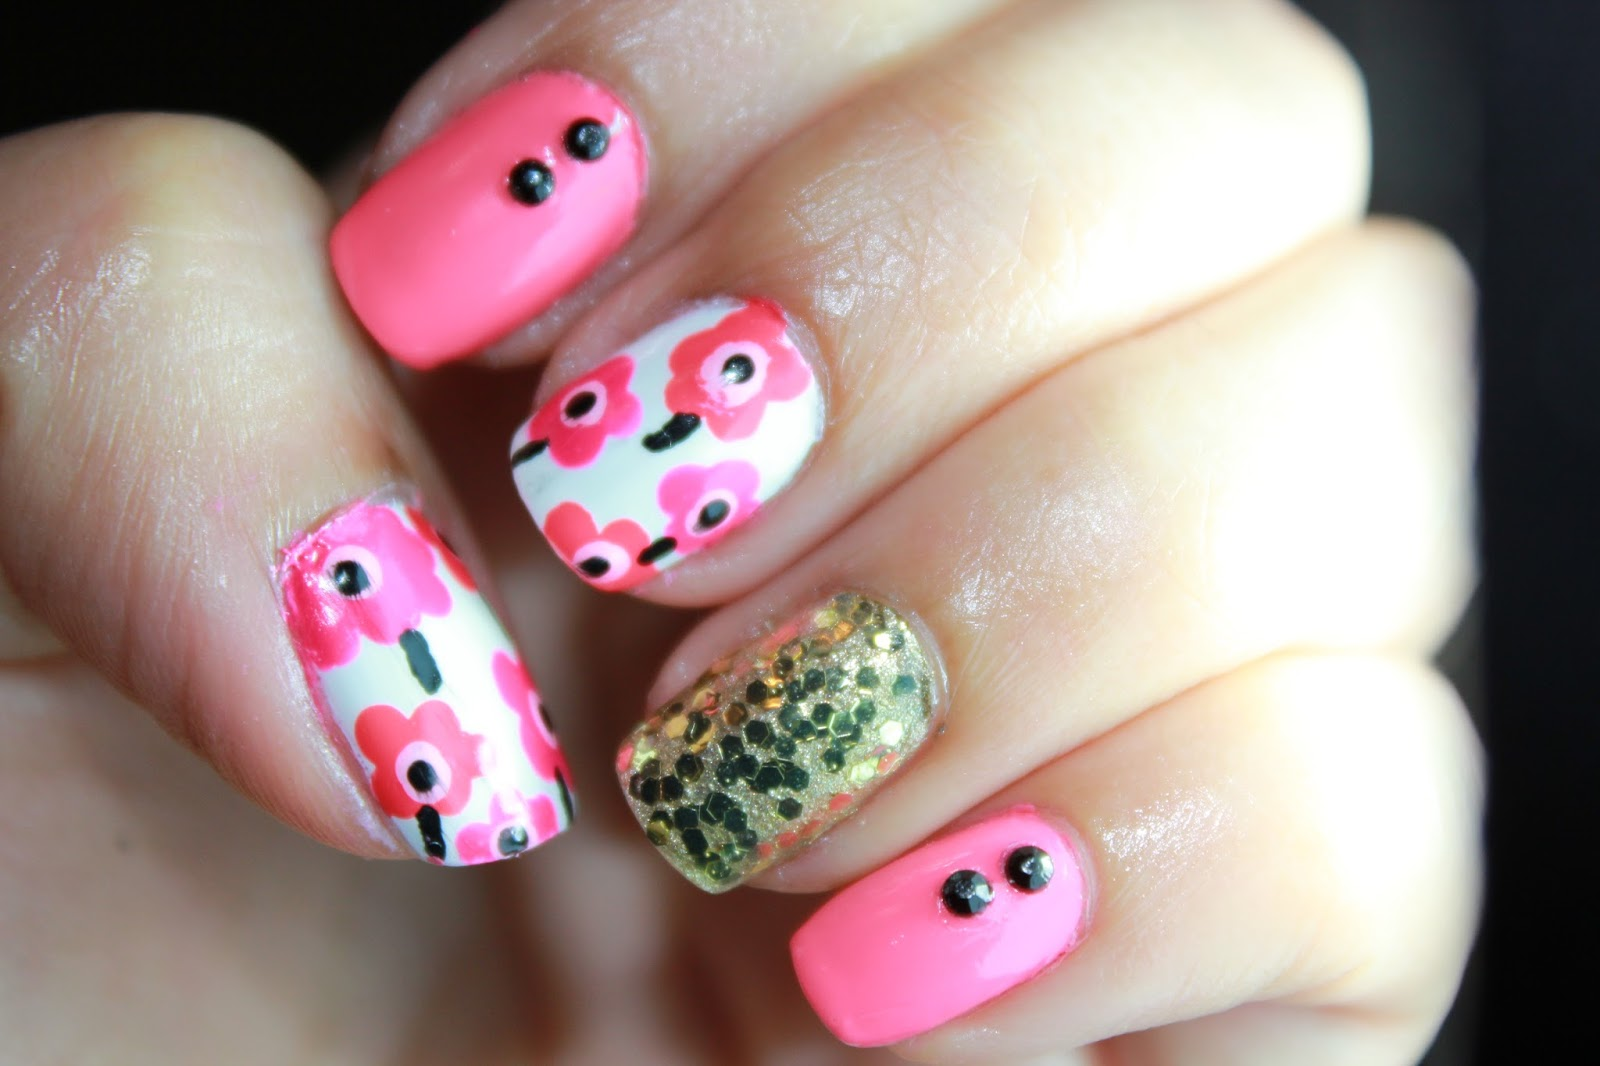 Nayelis Crafts The Creative Spot Marimekko Flower Nail Art Recreation